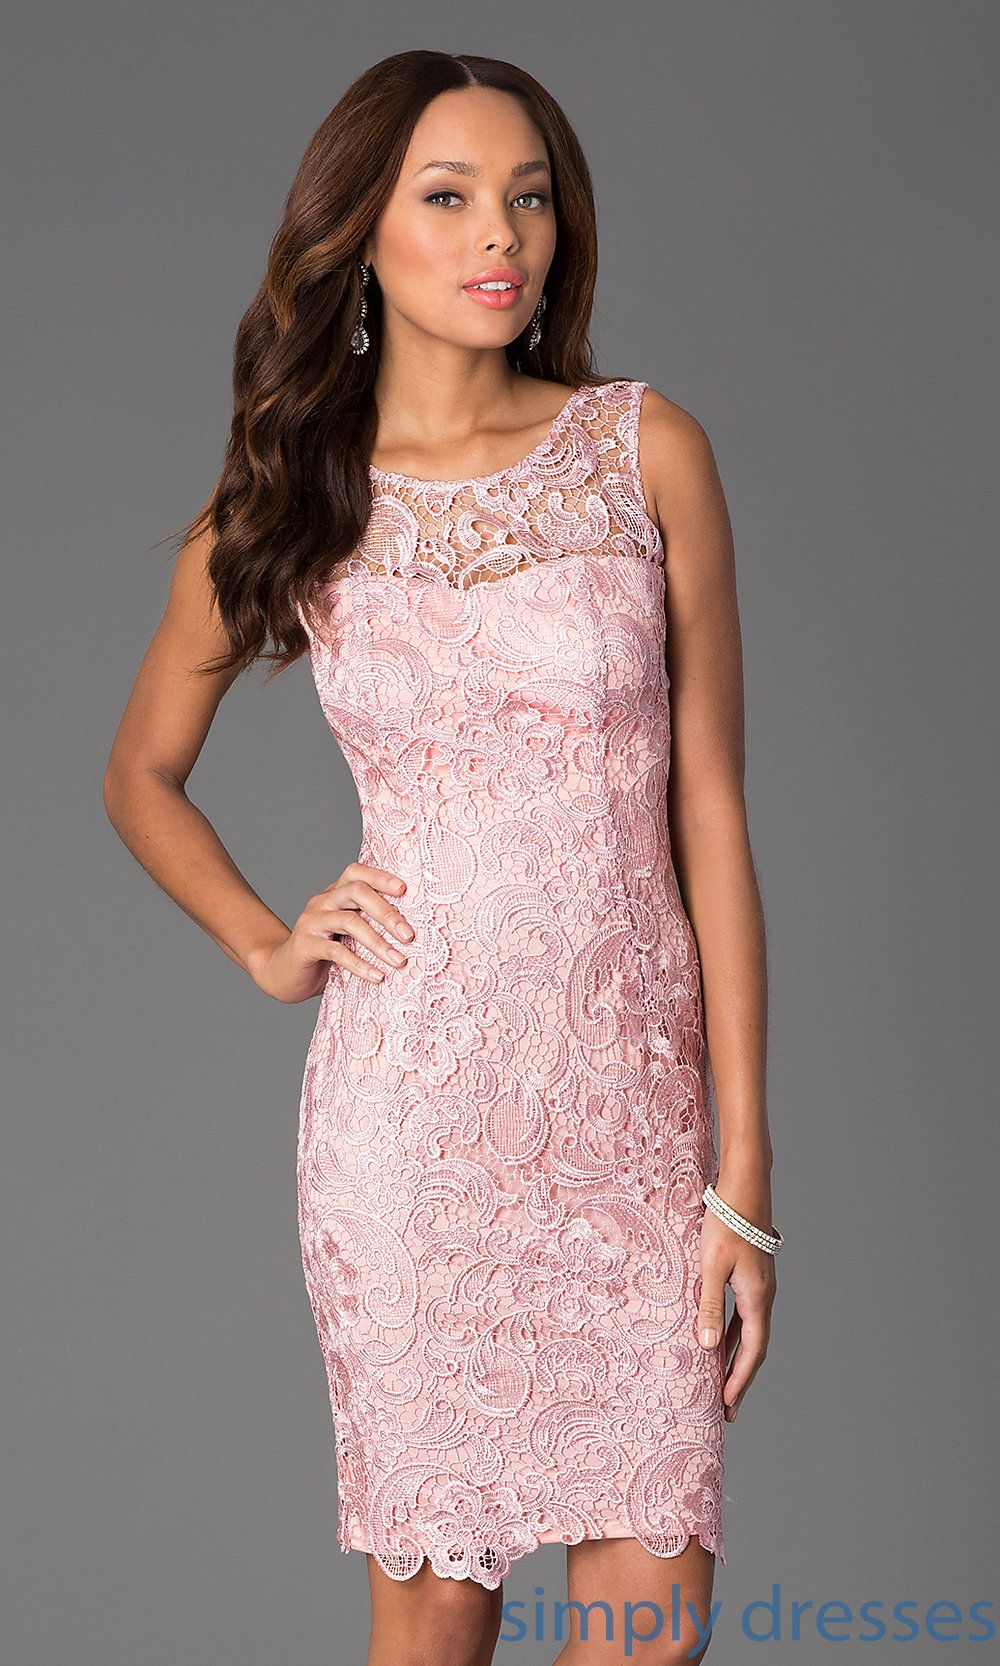 DQ-8842 - Sleeveless Lace Knee Length Cocktail Dress   Vestiditos